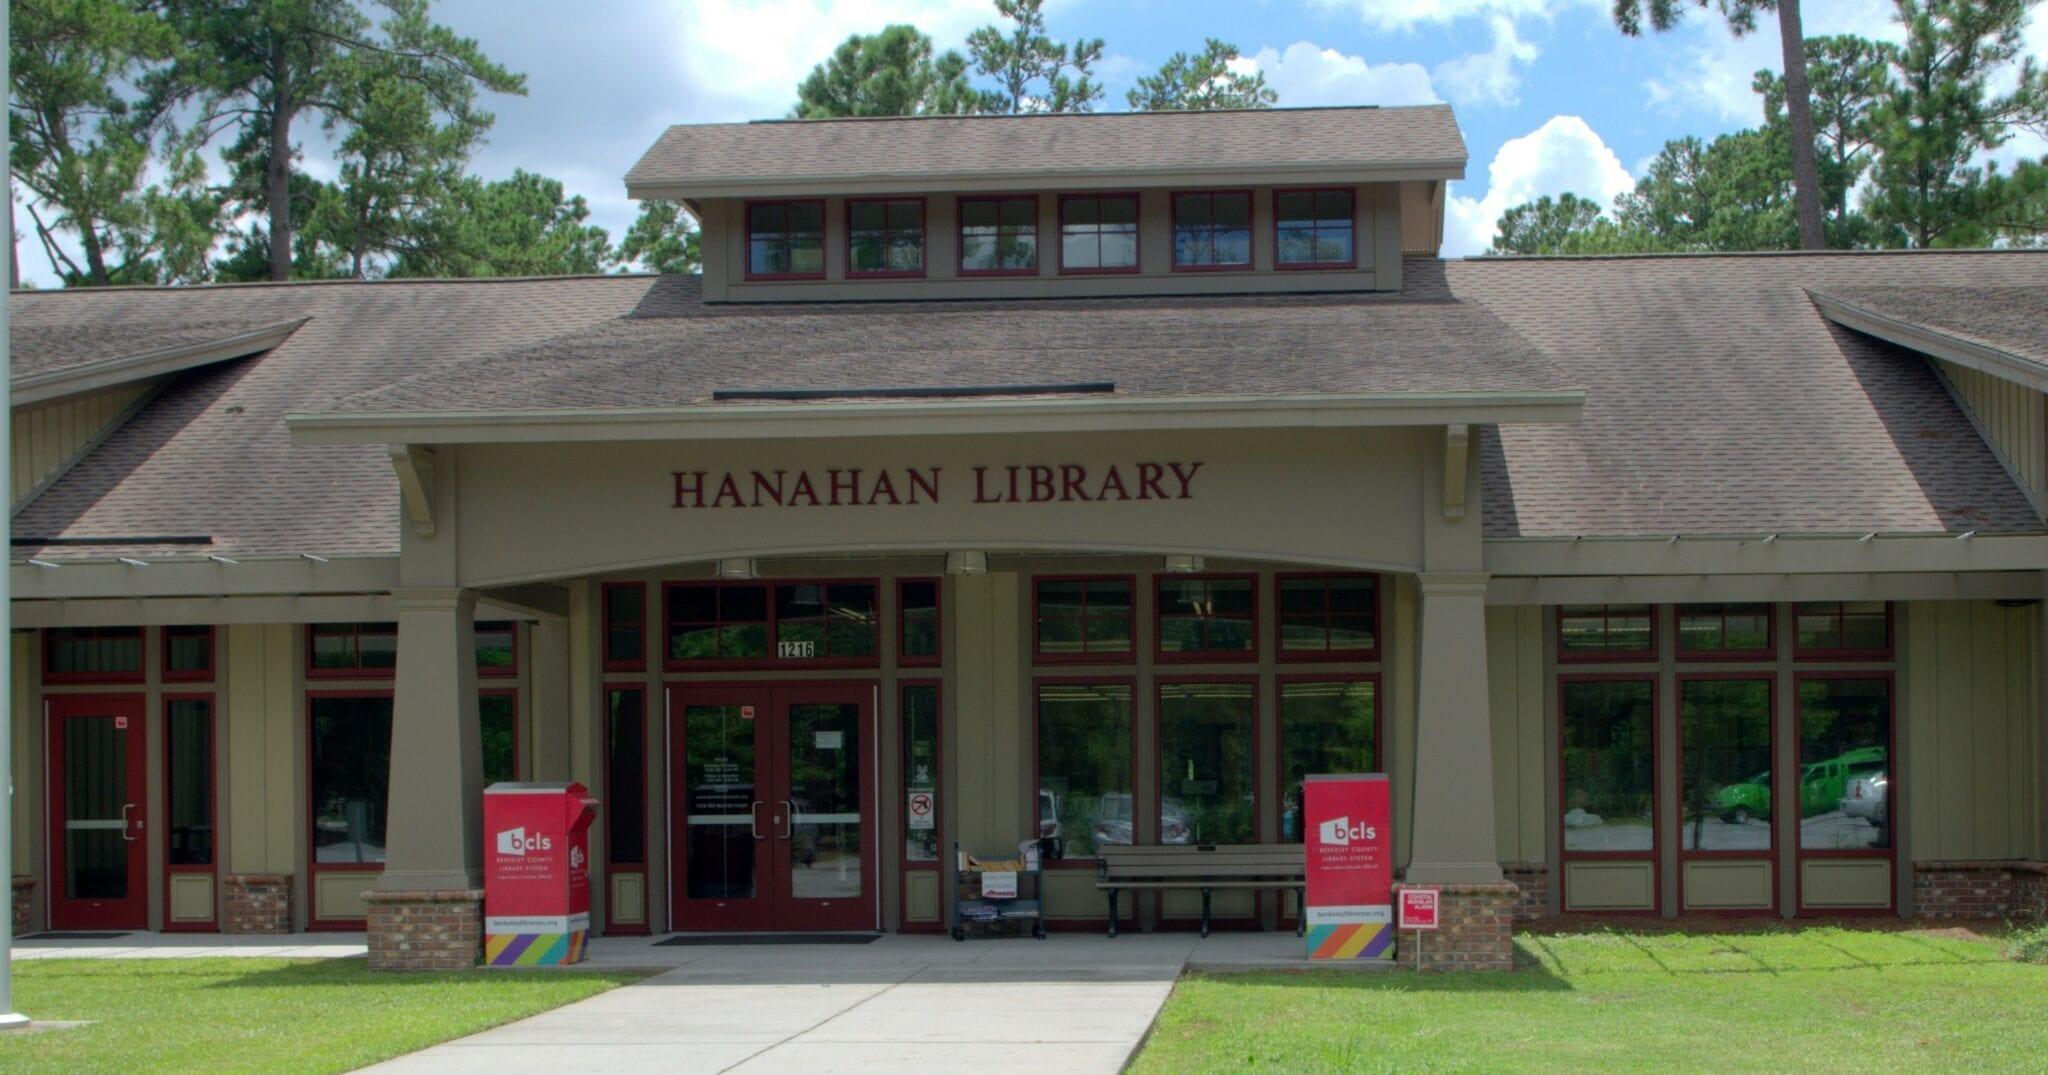 Hanahan Library